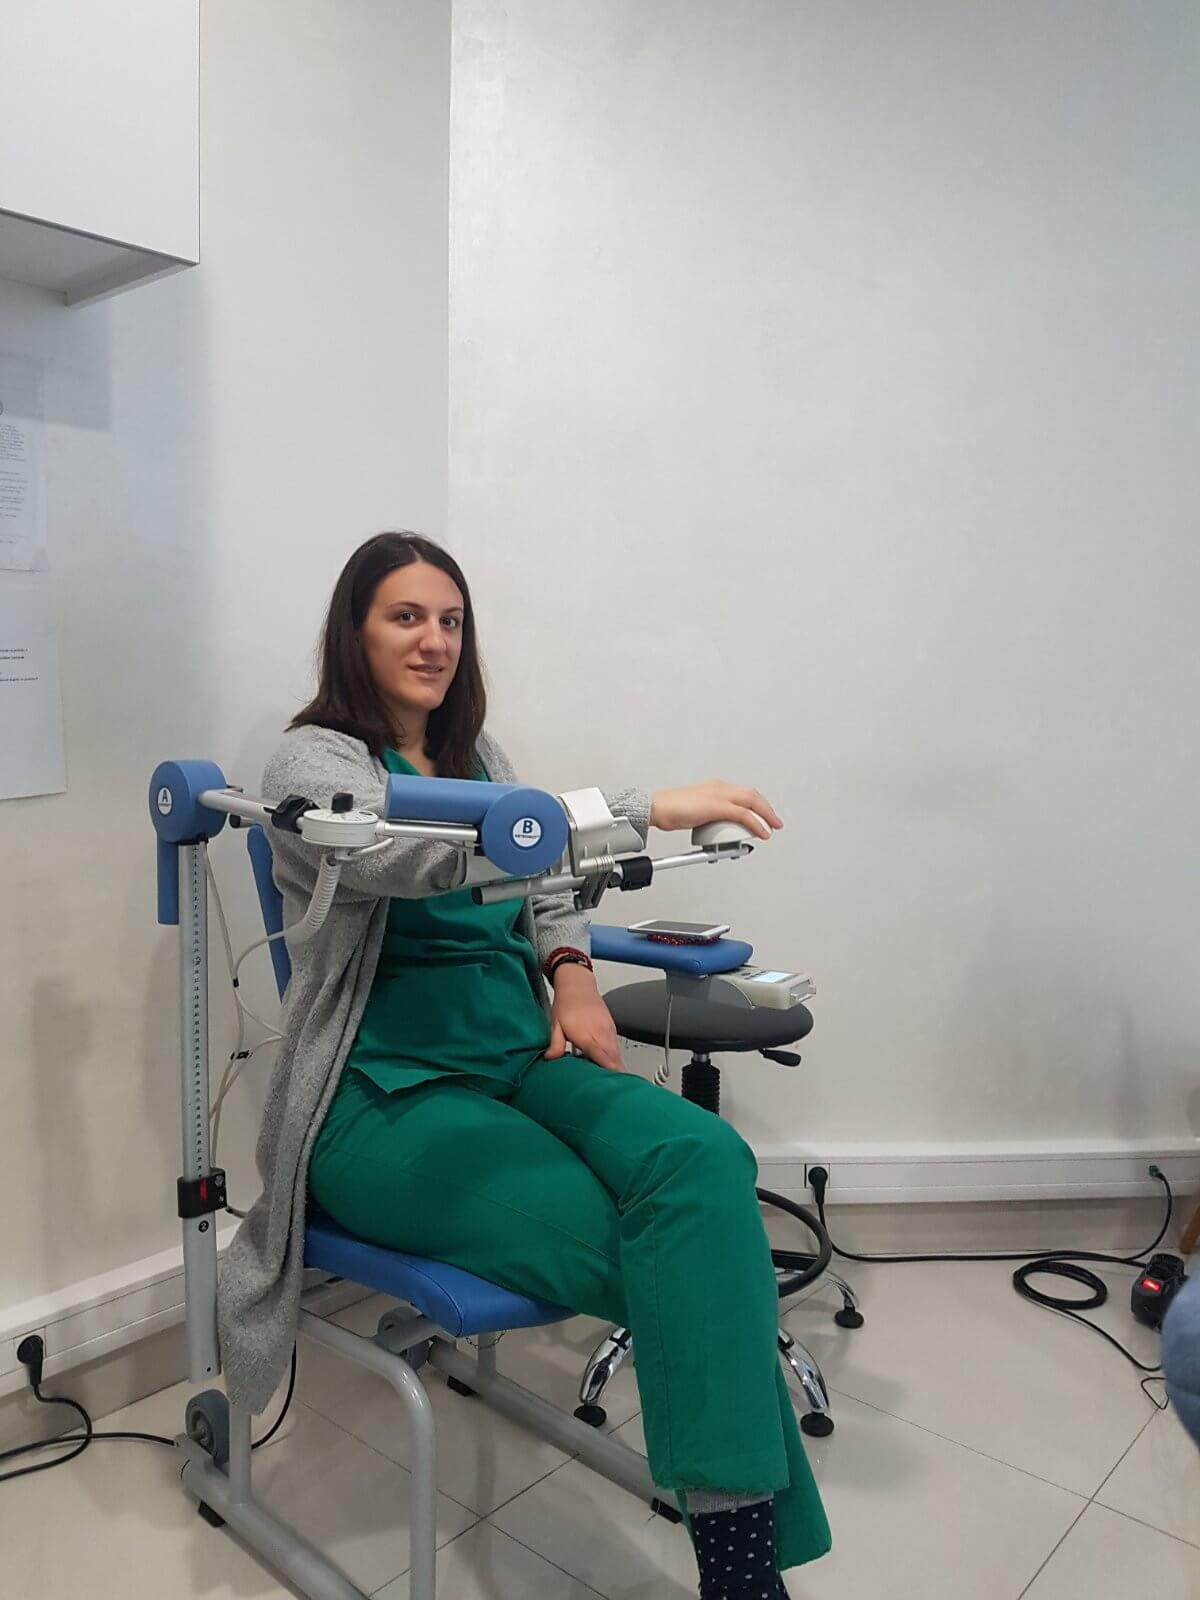 Rehabilitacija na našem CPM robotu. Savršen lek kod dijagnoze SMRZNUTO RAME!